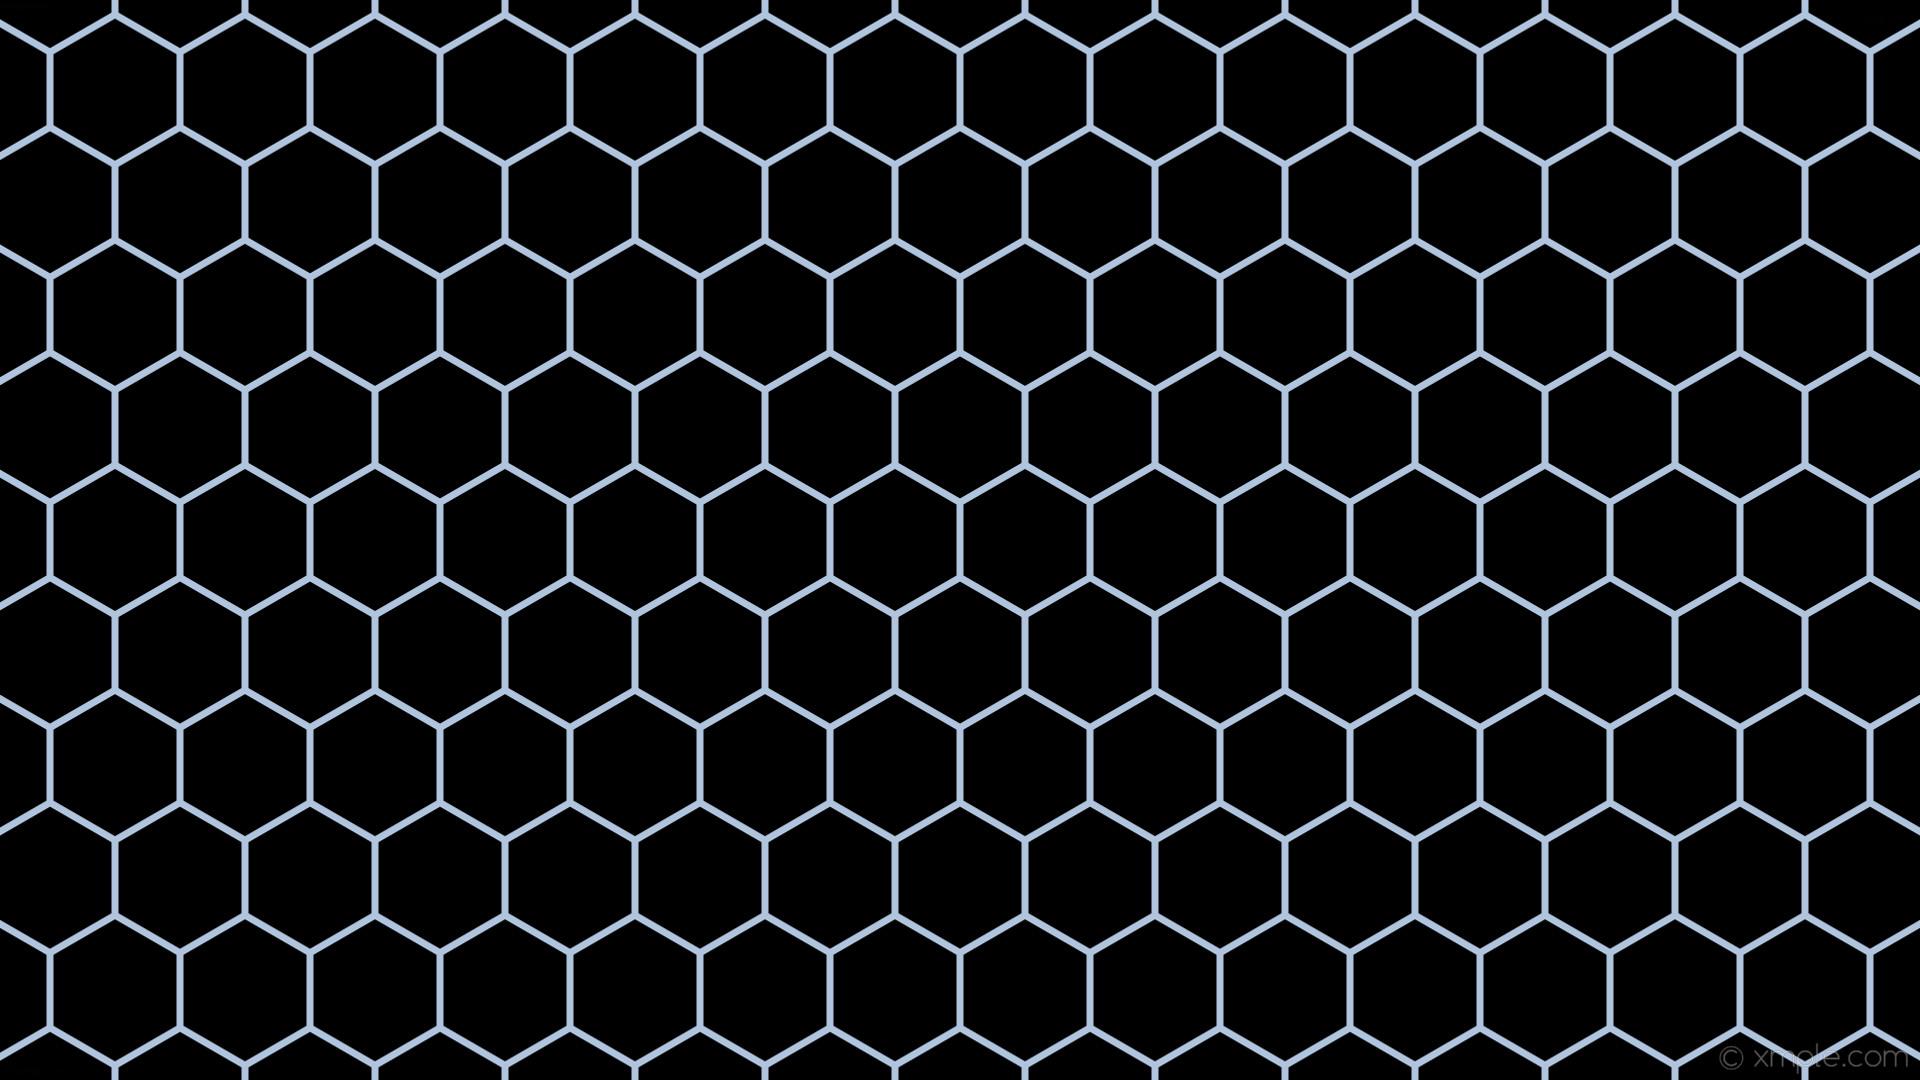 wallpaper beehive honeycomb blue hexagon black light steel blue #000000  #b0c4de 0° 7px